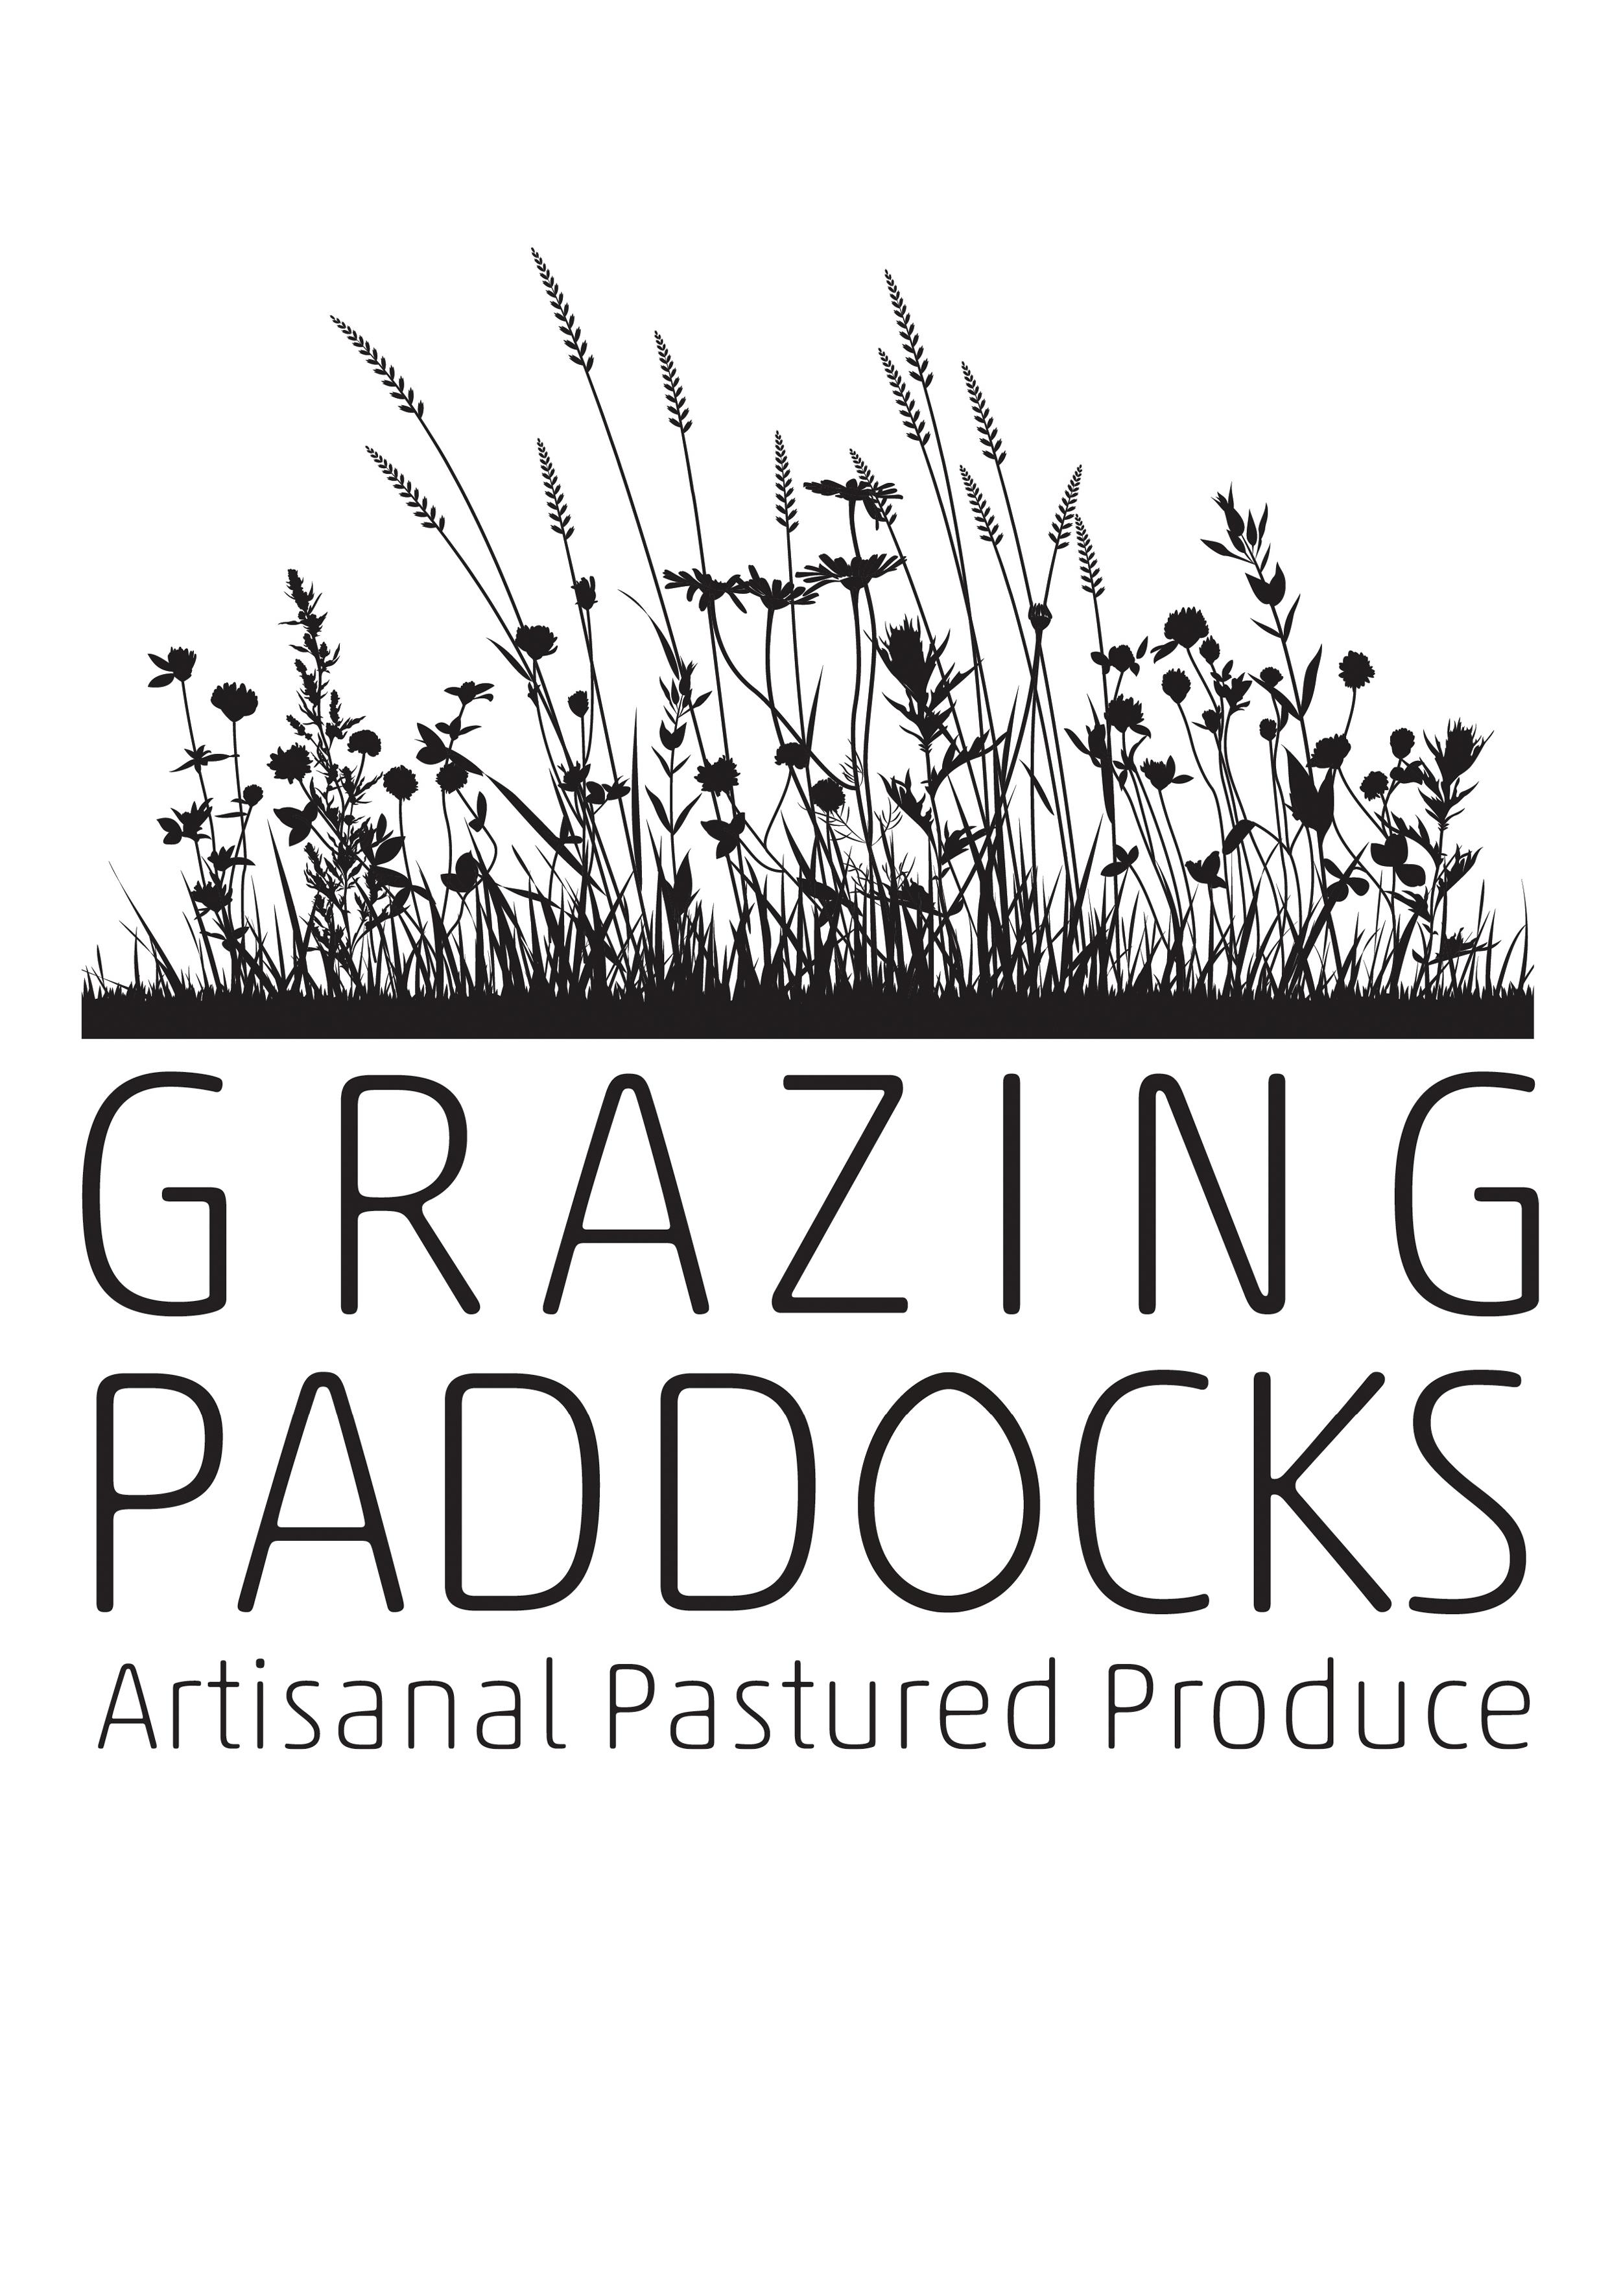 logo  grazing paddocks